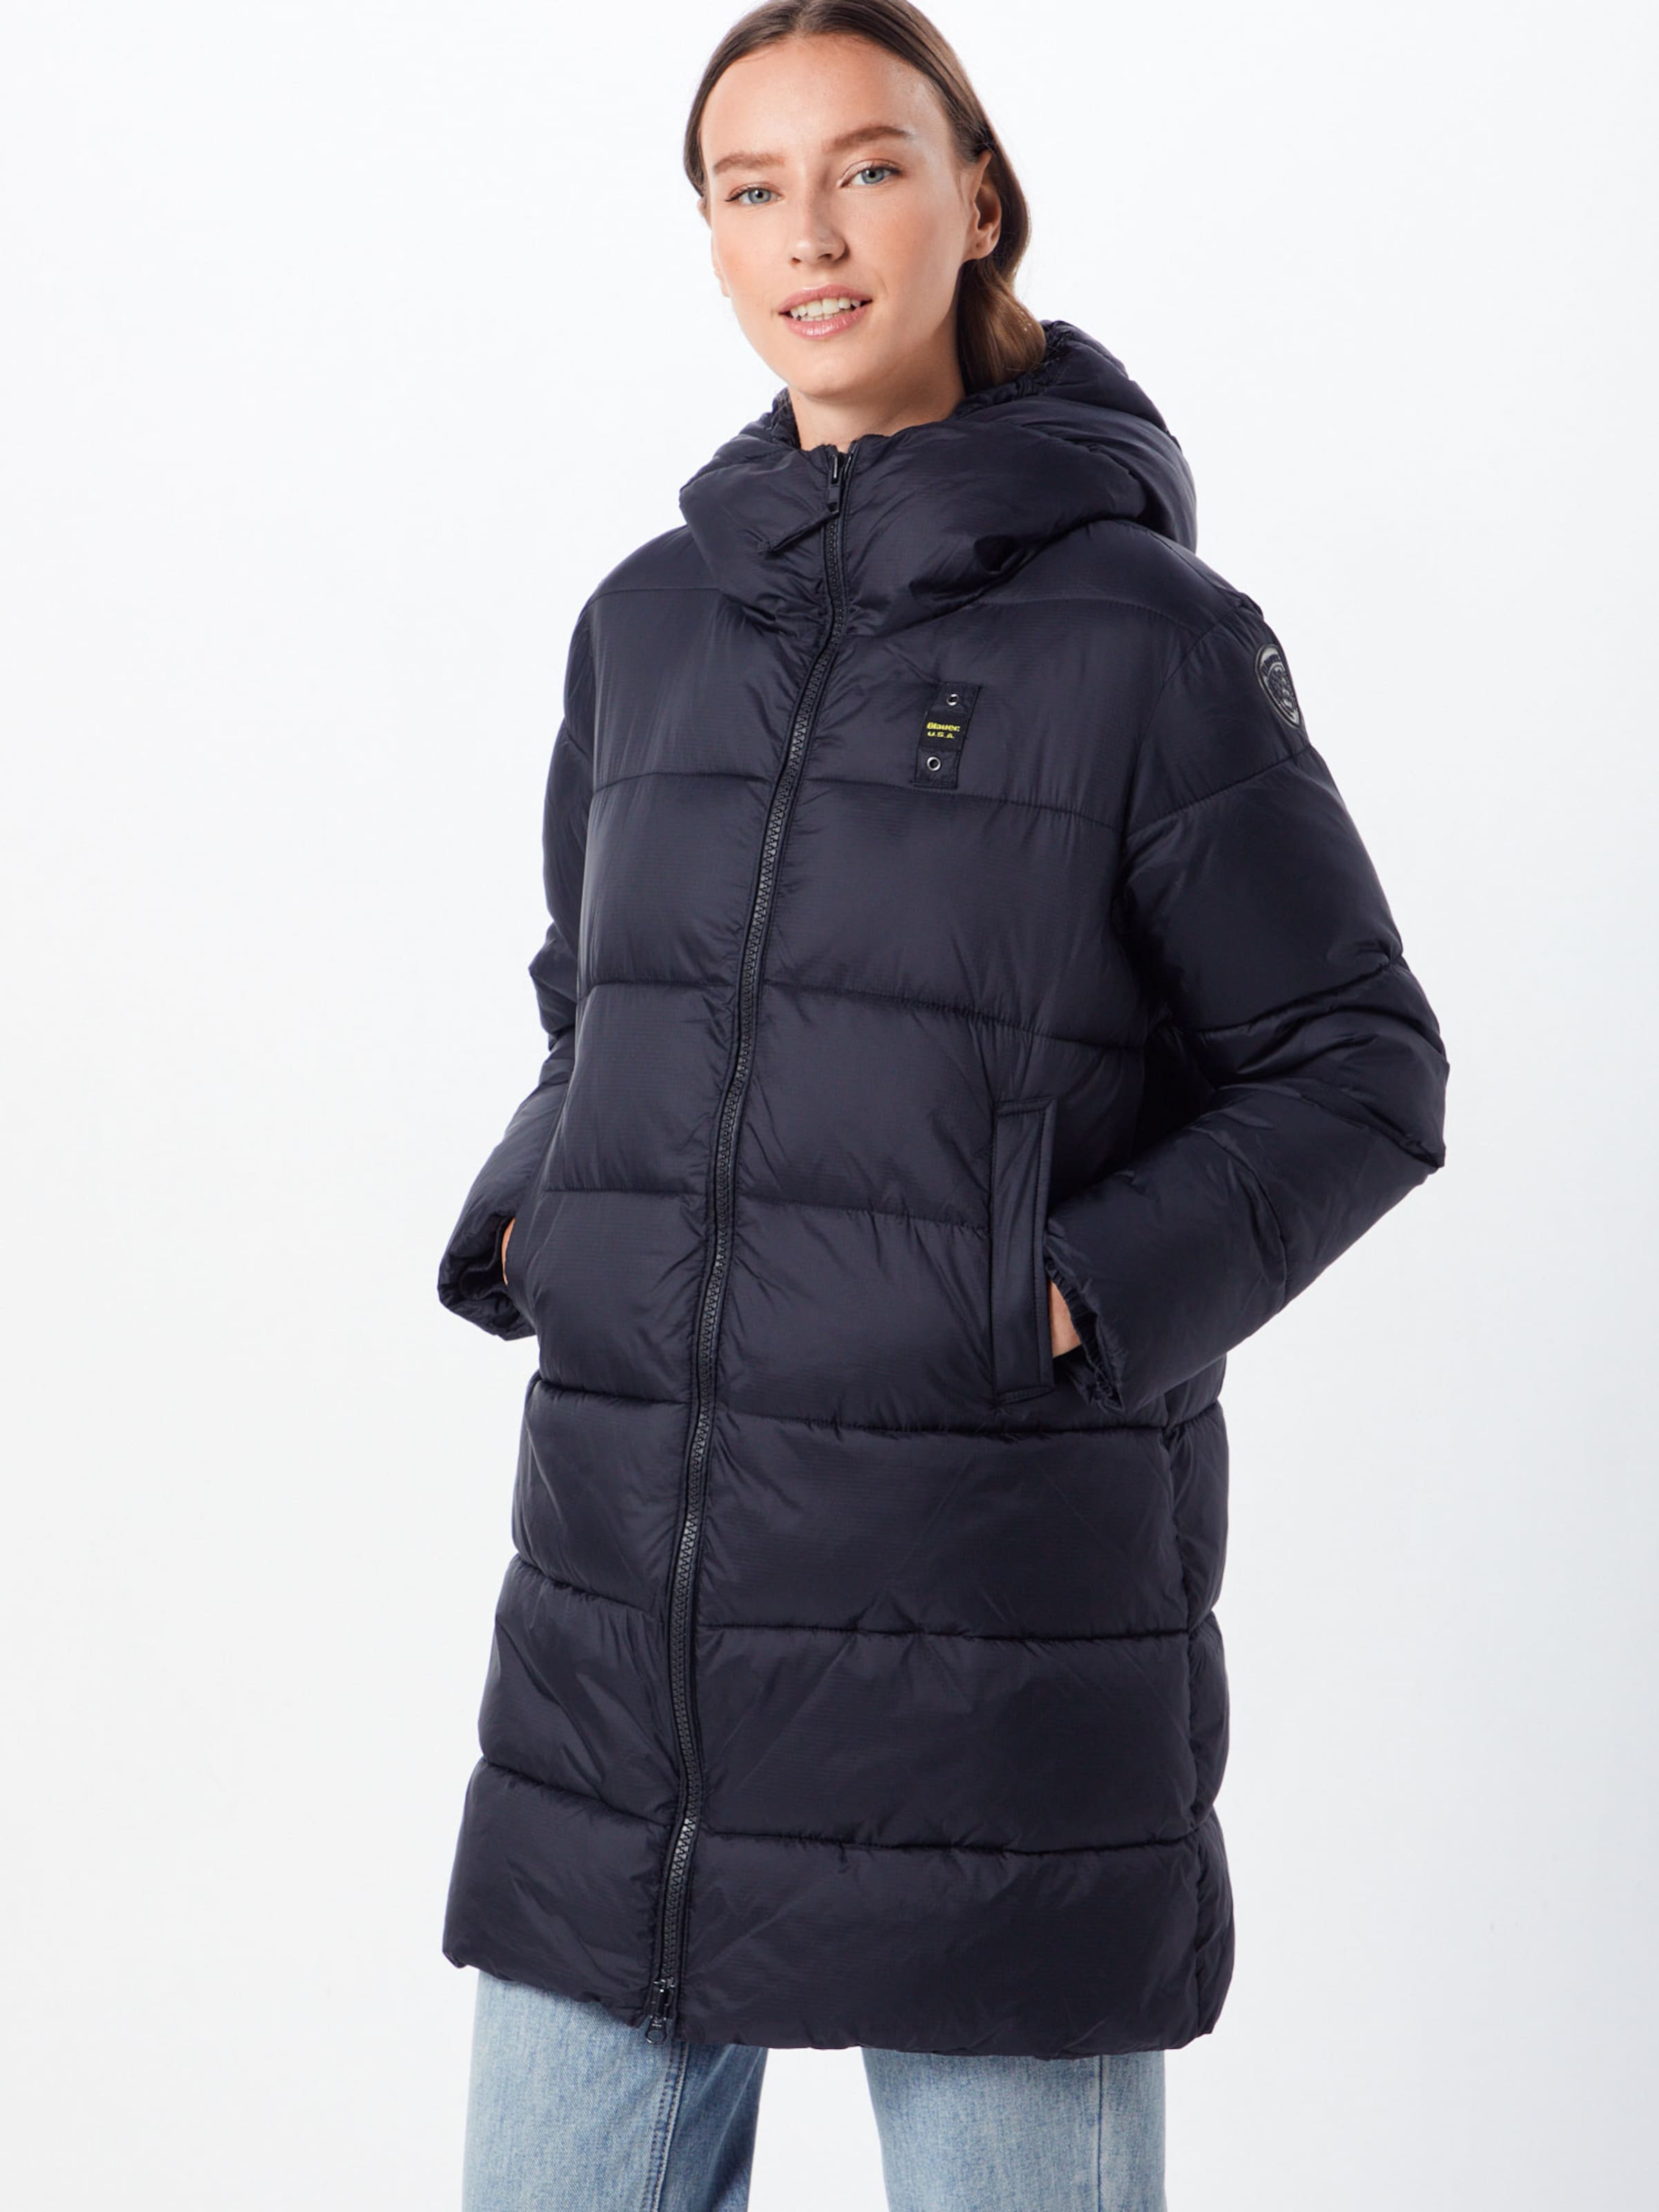 Blauer usa 'impermeabile' Mantel In Schwarz TKJclF31